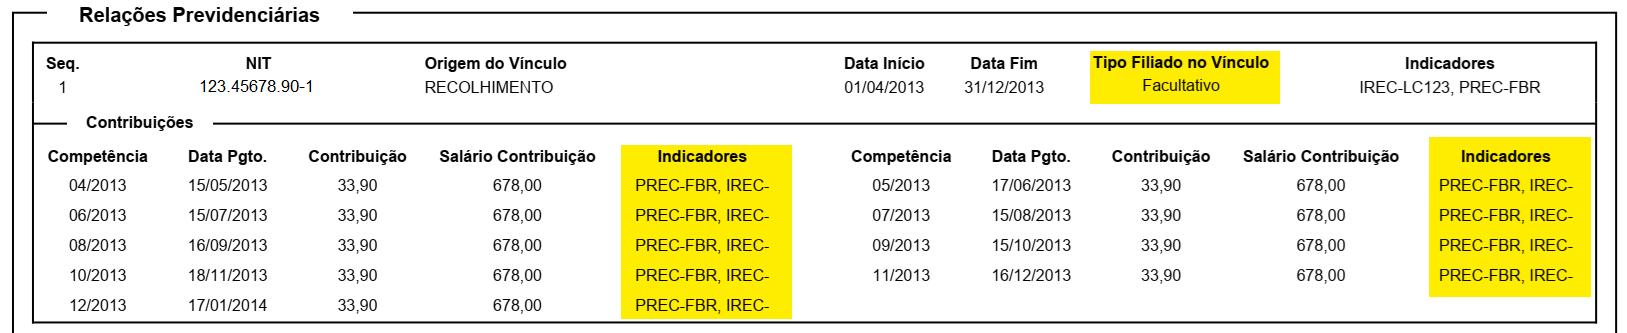 cnis-exemplo-siglas-campo-indicadores